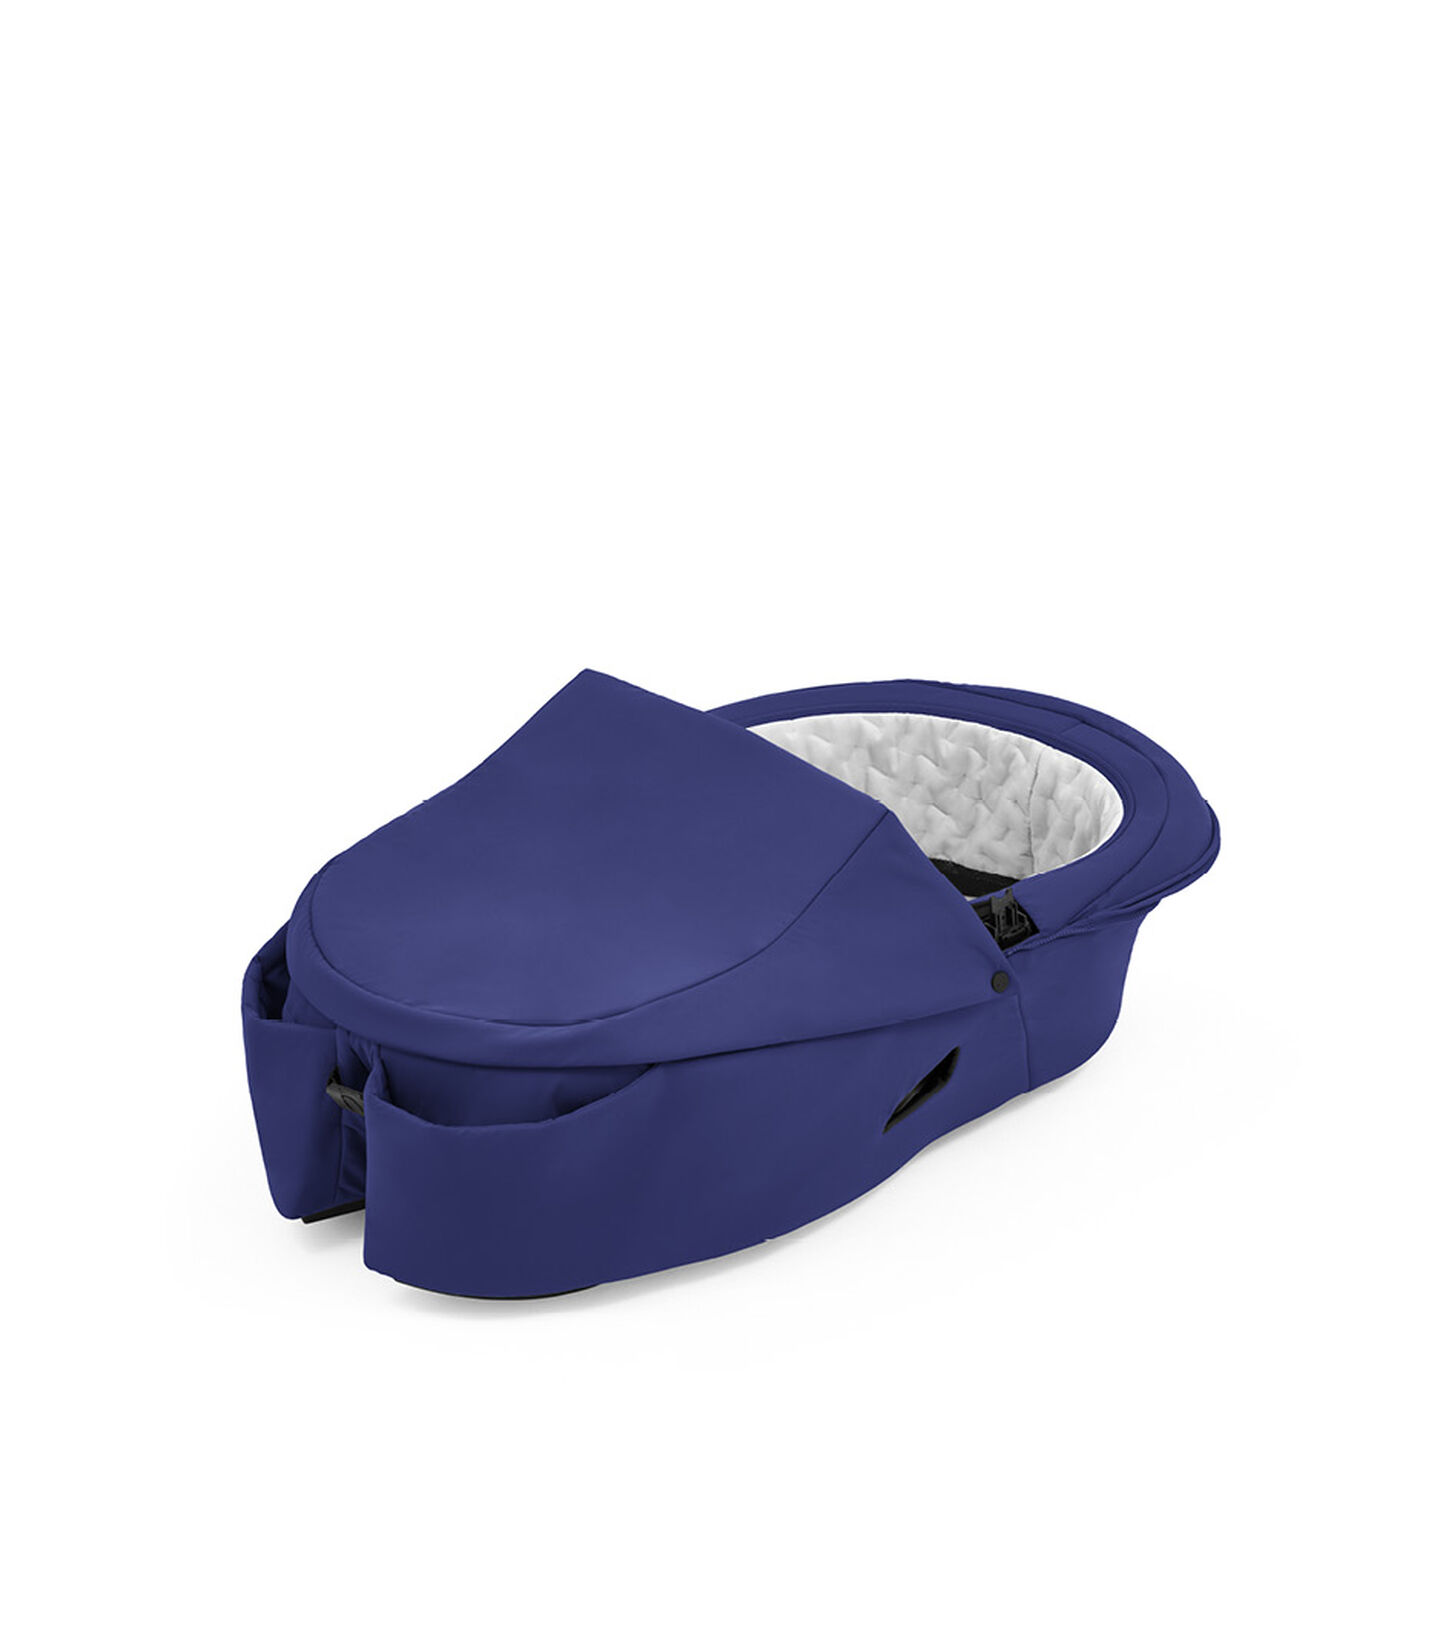 Stokke® Xplory® X Royal Blue Carry Cot, no canopy. view 2